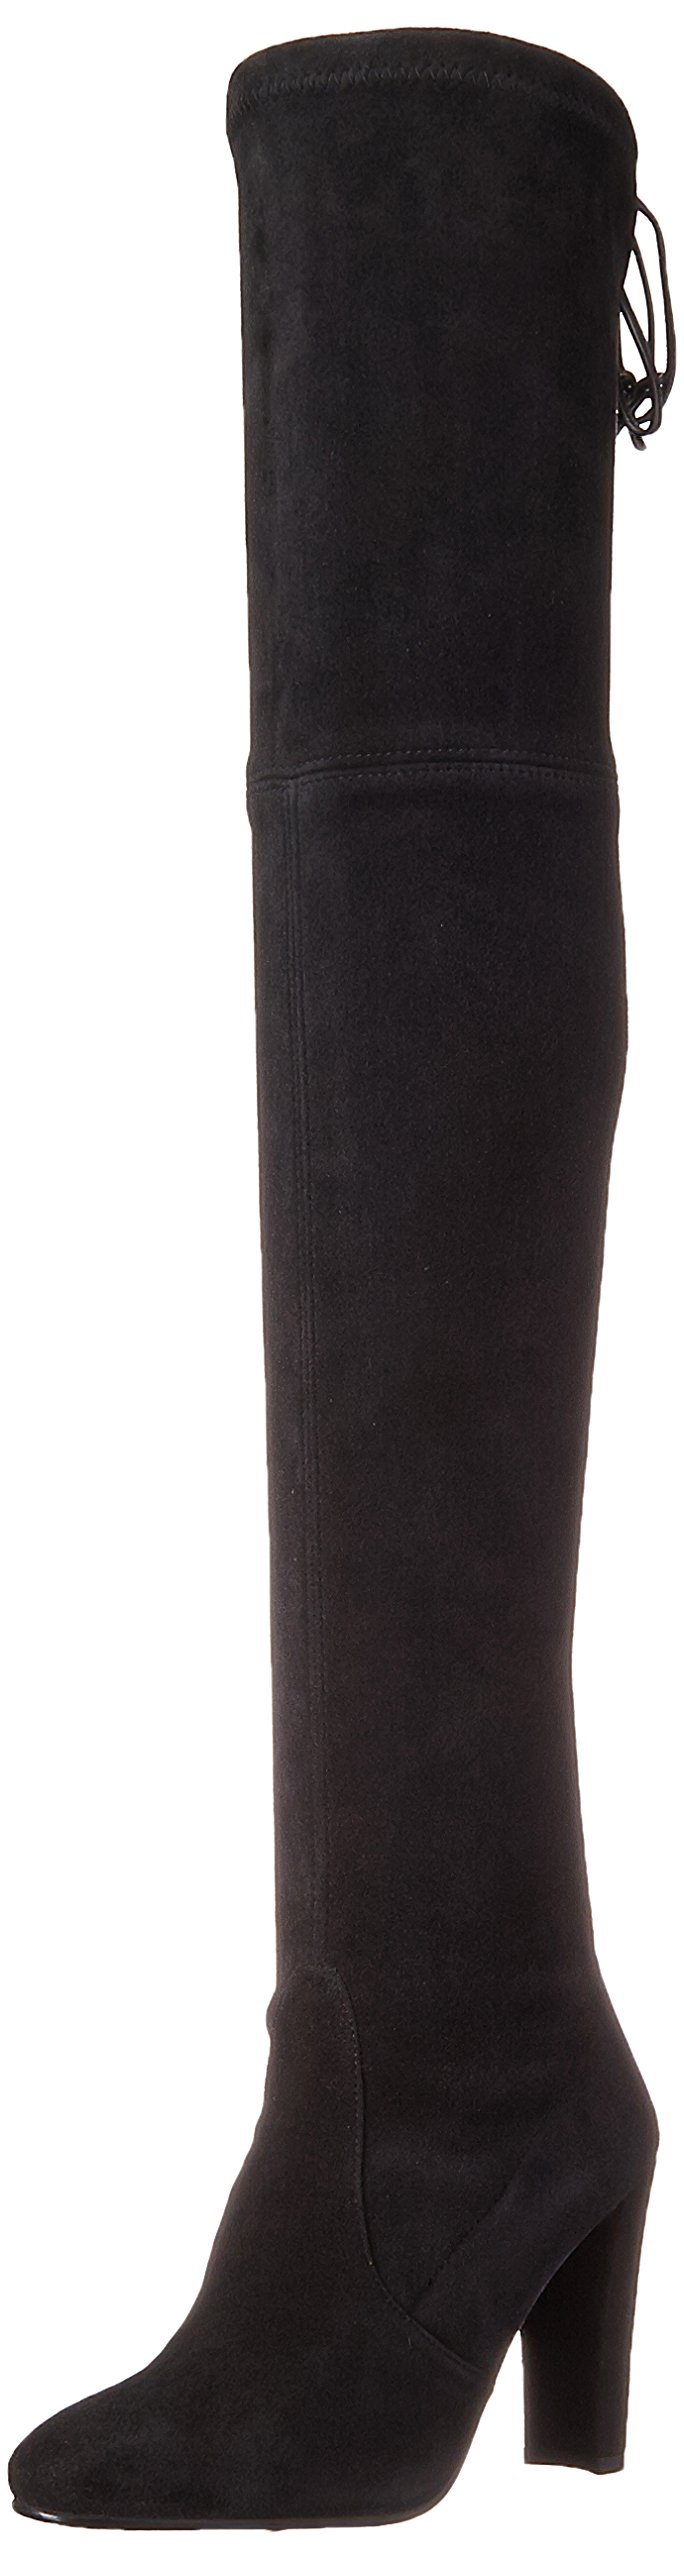 Stuart Weitzman Women's Highland Over-the-Knee Boot,Black,7 M US